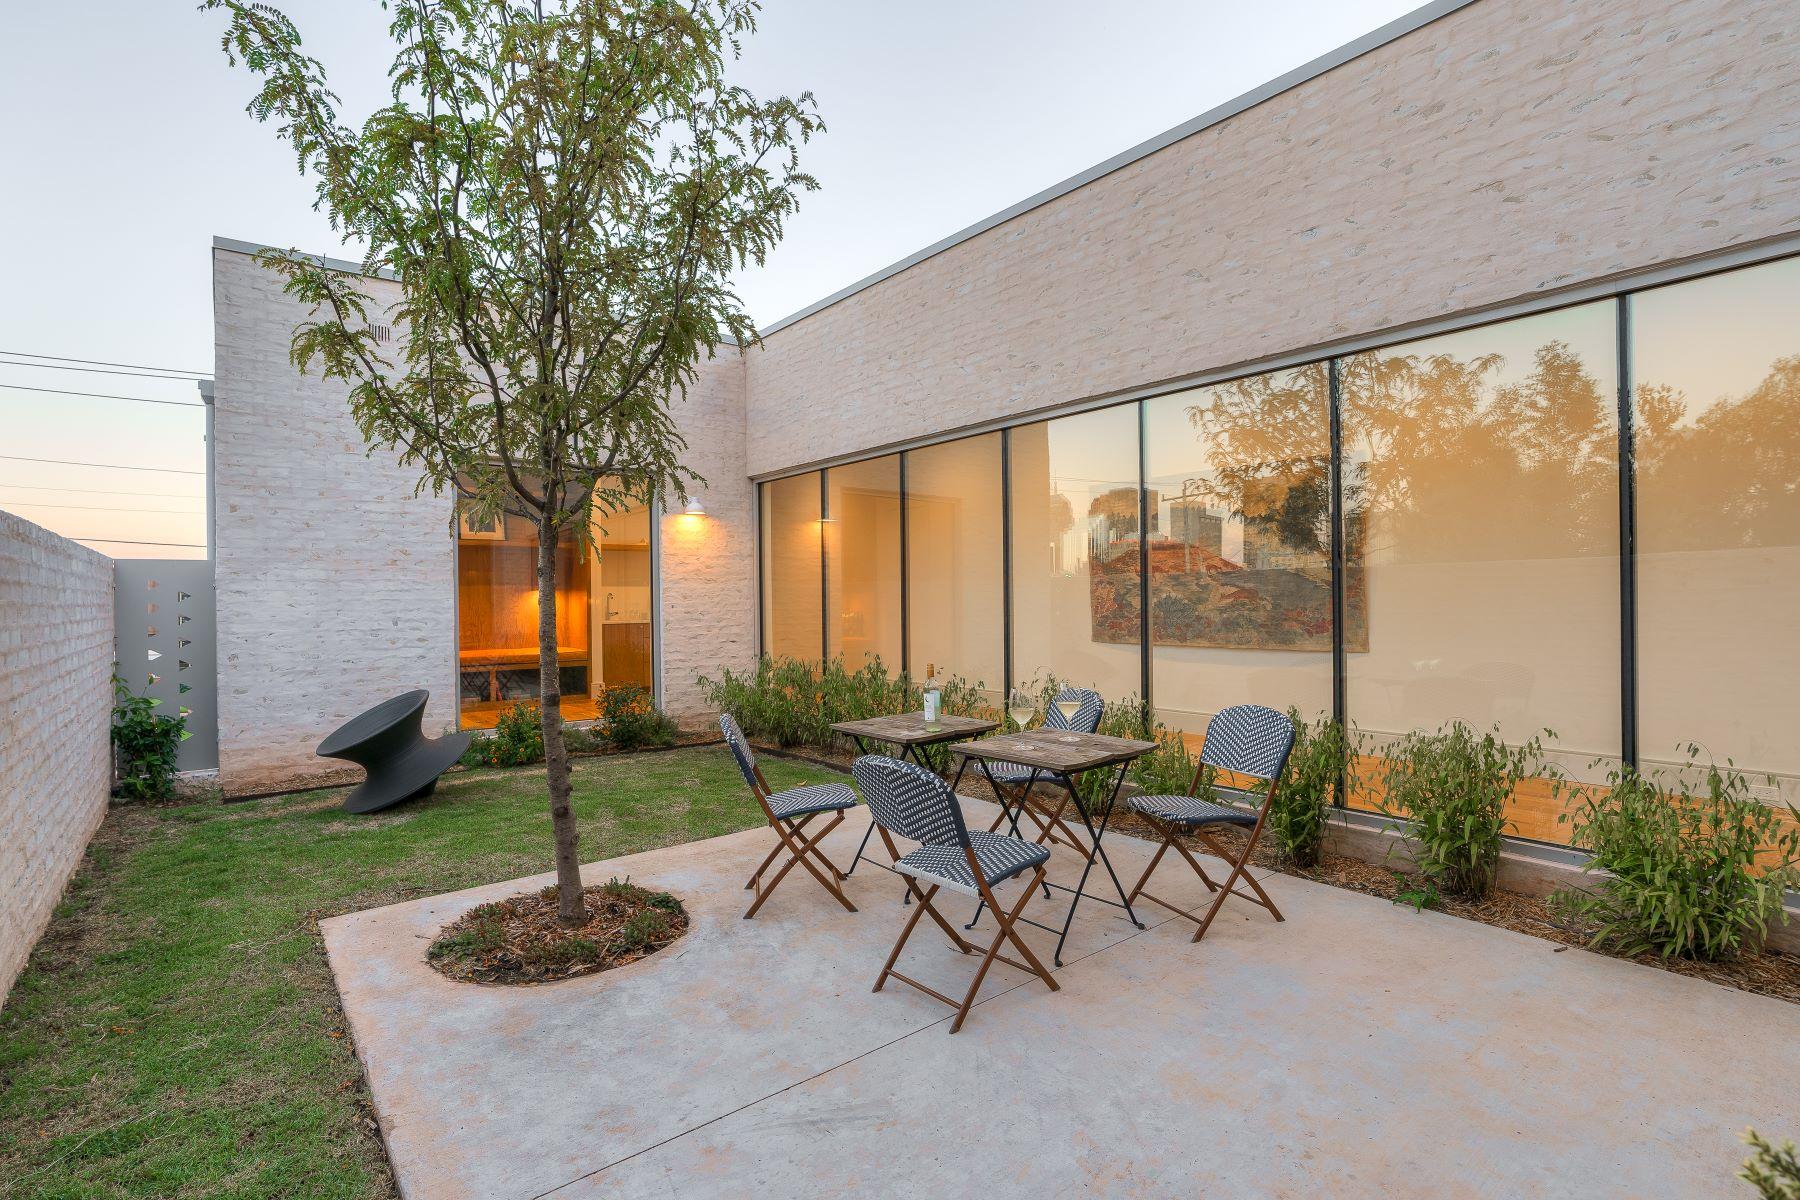 Single Family Homes for Sale at Contemporary Reposal in SoSA 614 NW 6th Street Oklahoma City, Oklahoma 73102 United States